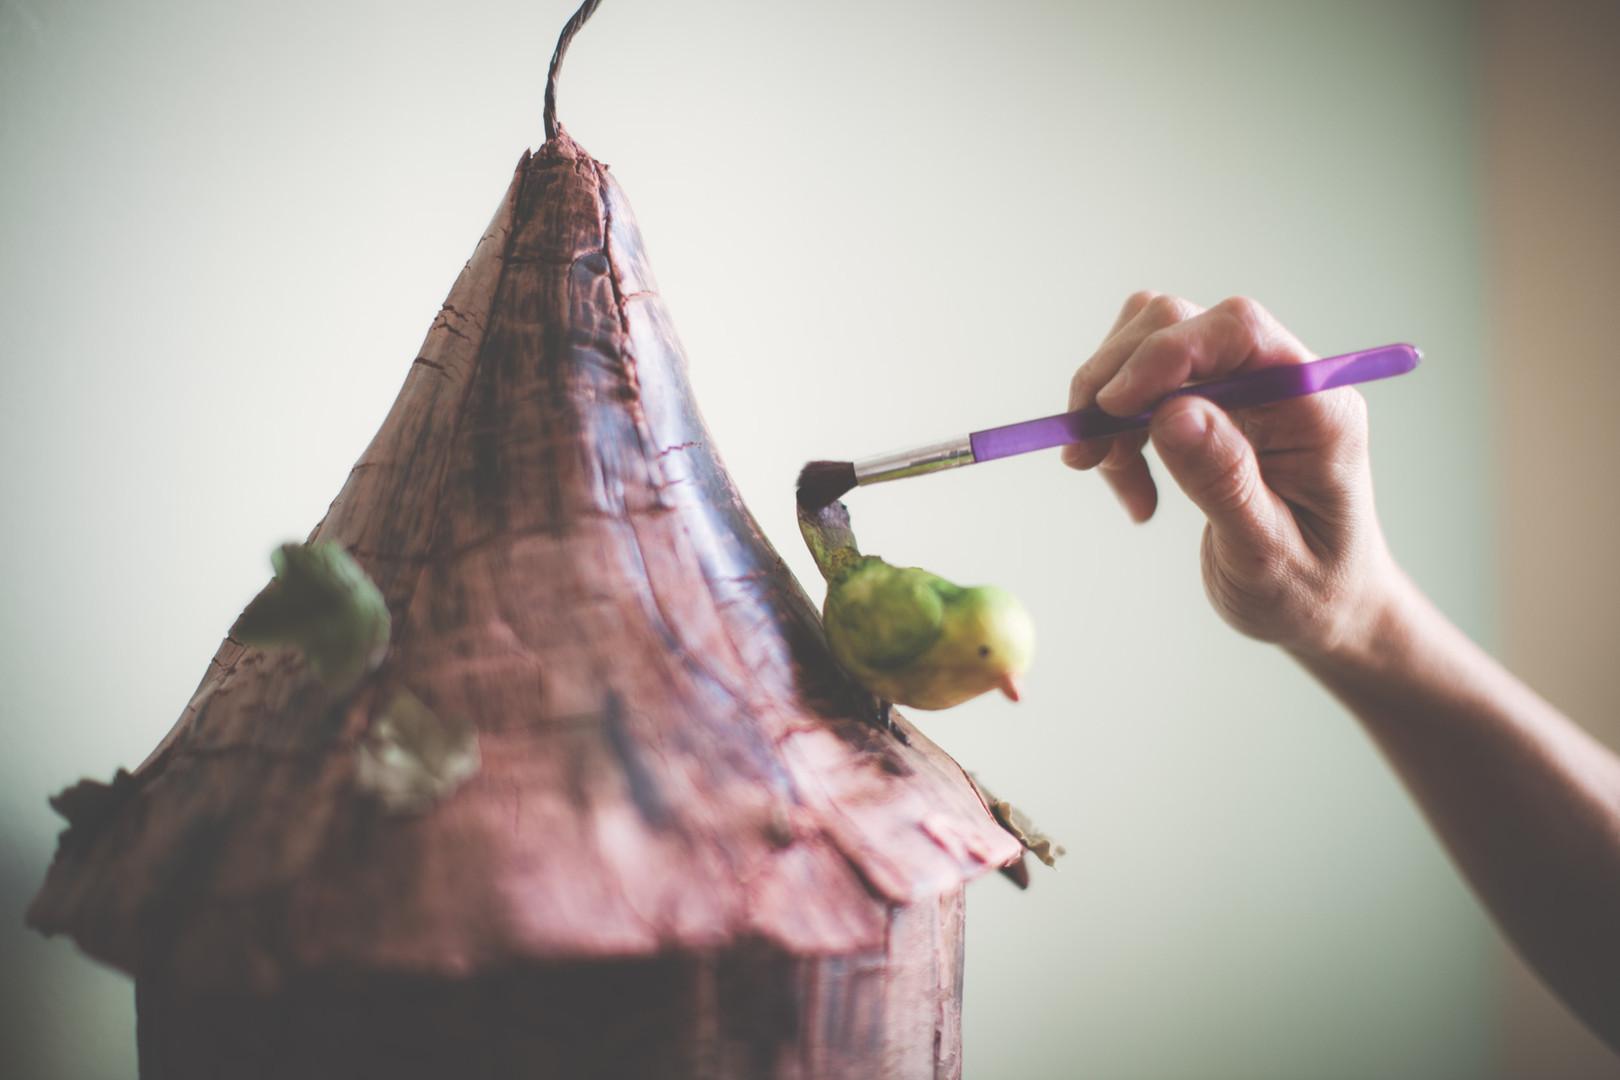 Cramela-painting-treecake 2.jpg